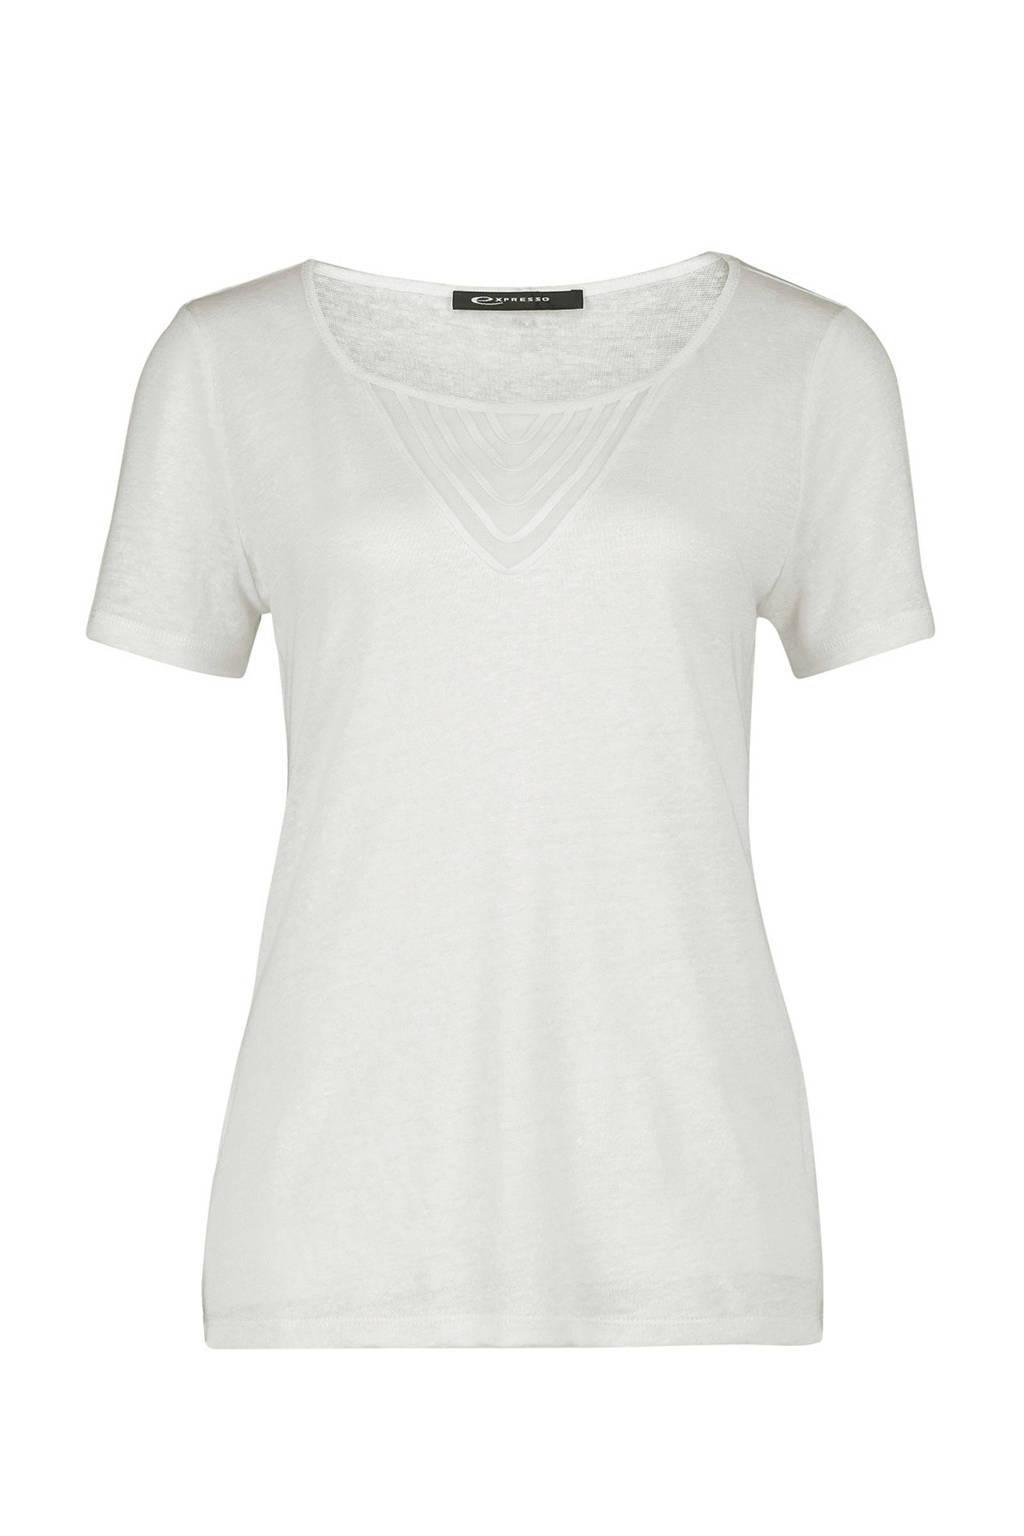 081061eb5c9 Expresso linnen T-shirt Bibi gebroken wit   wehkamp